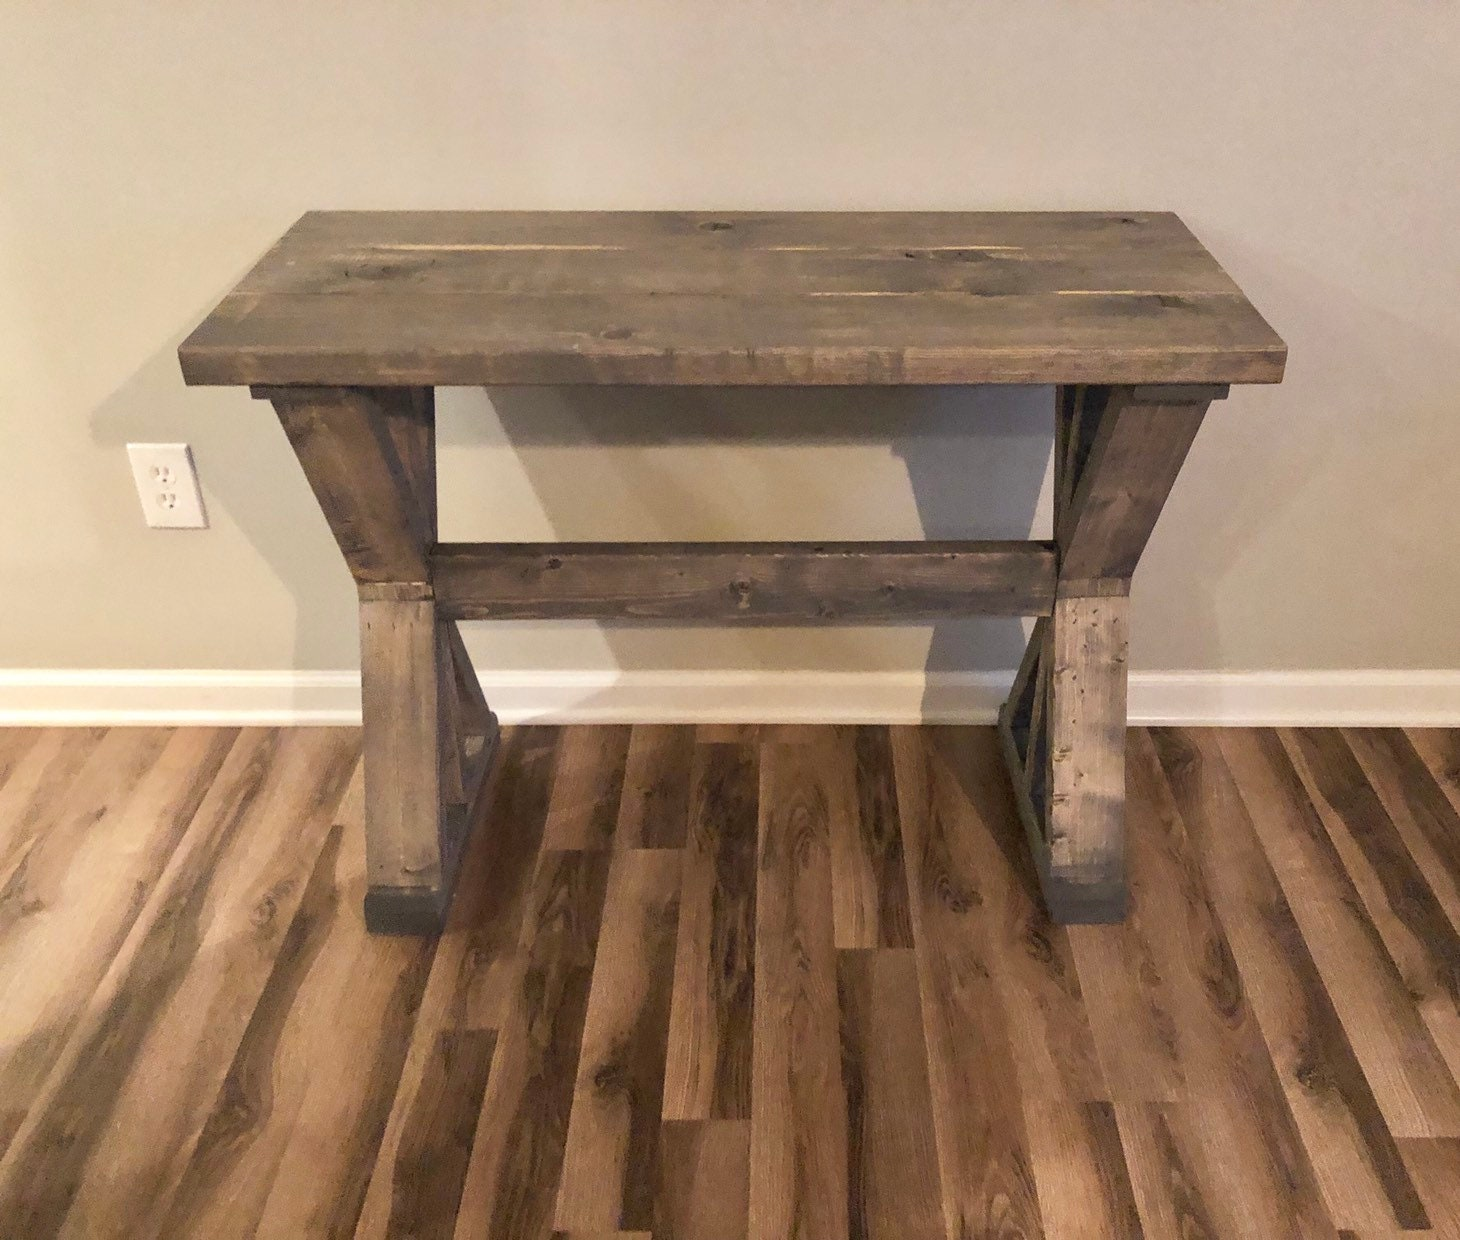 40 Farmhouse Console Table: 16.5 Depth Farmhouse Rustic Entryway Table, Console Table